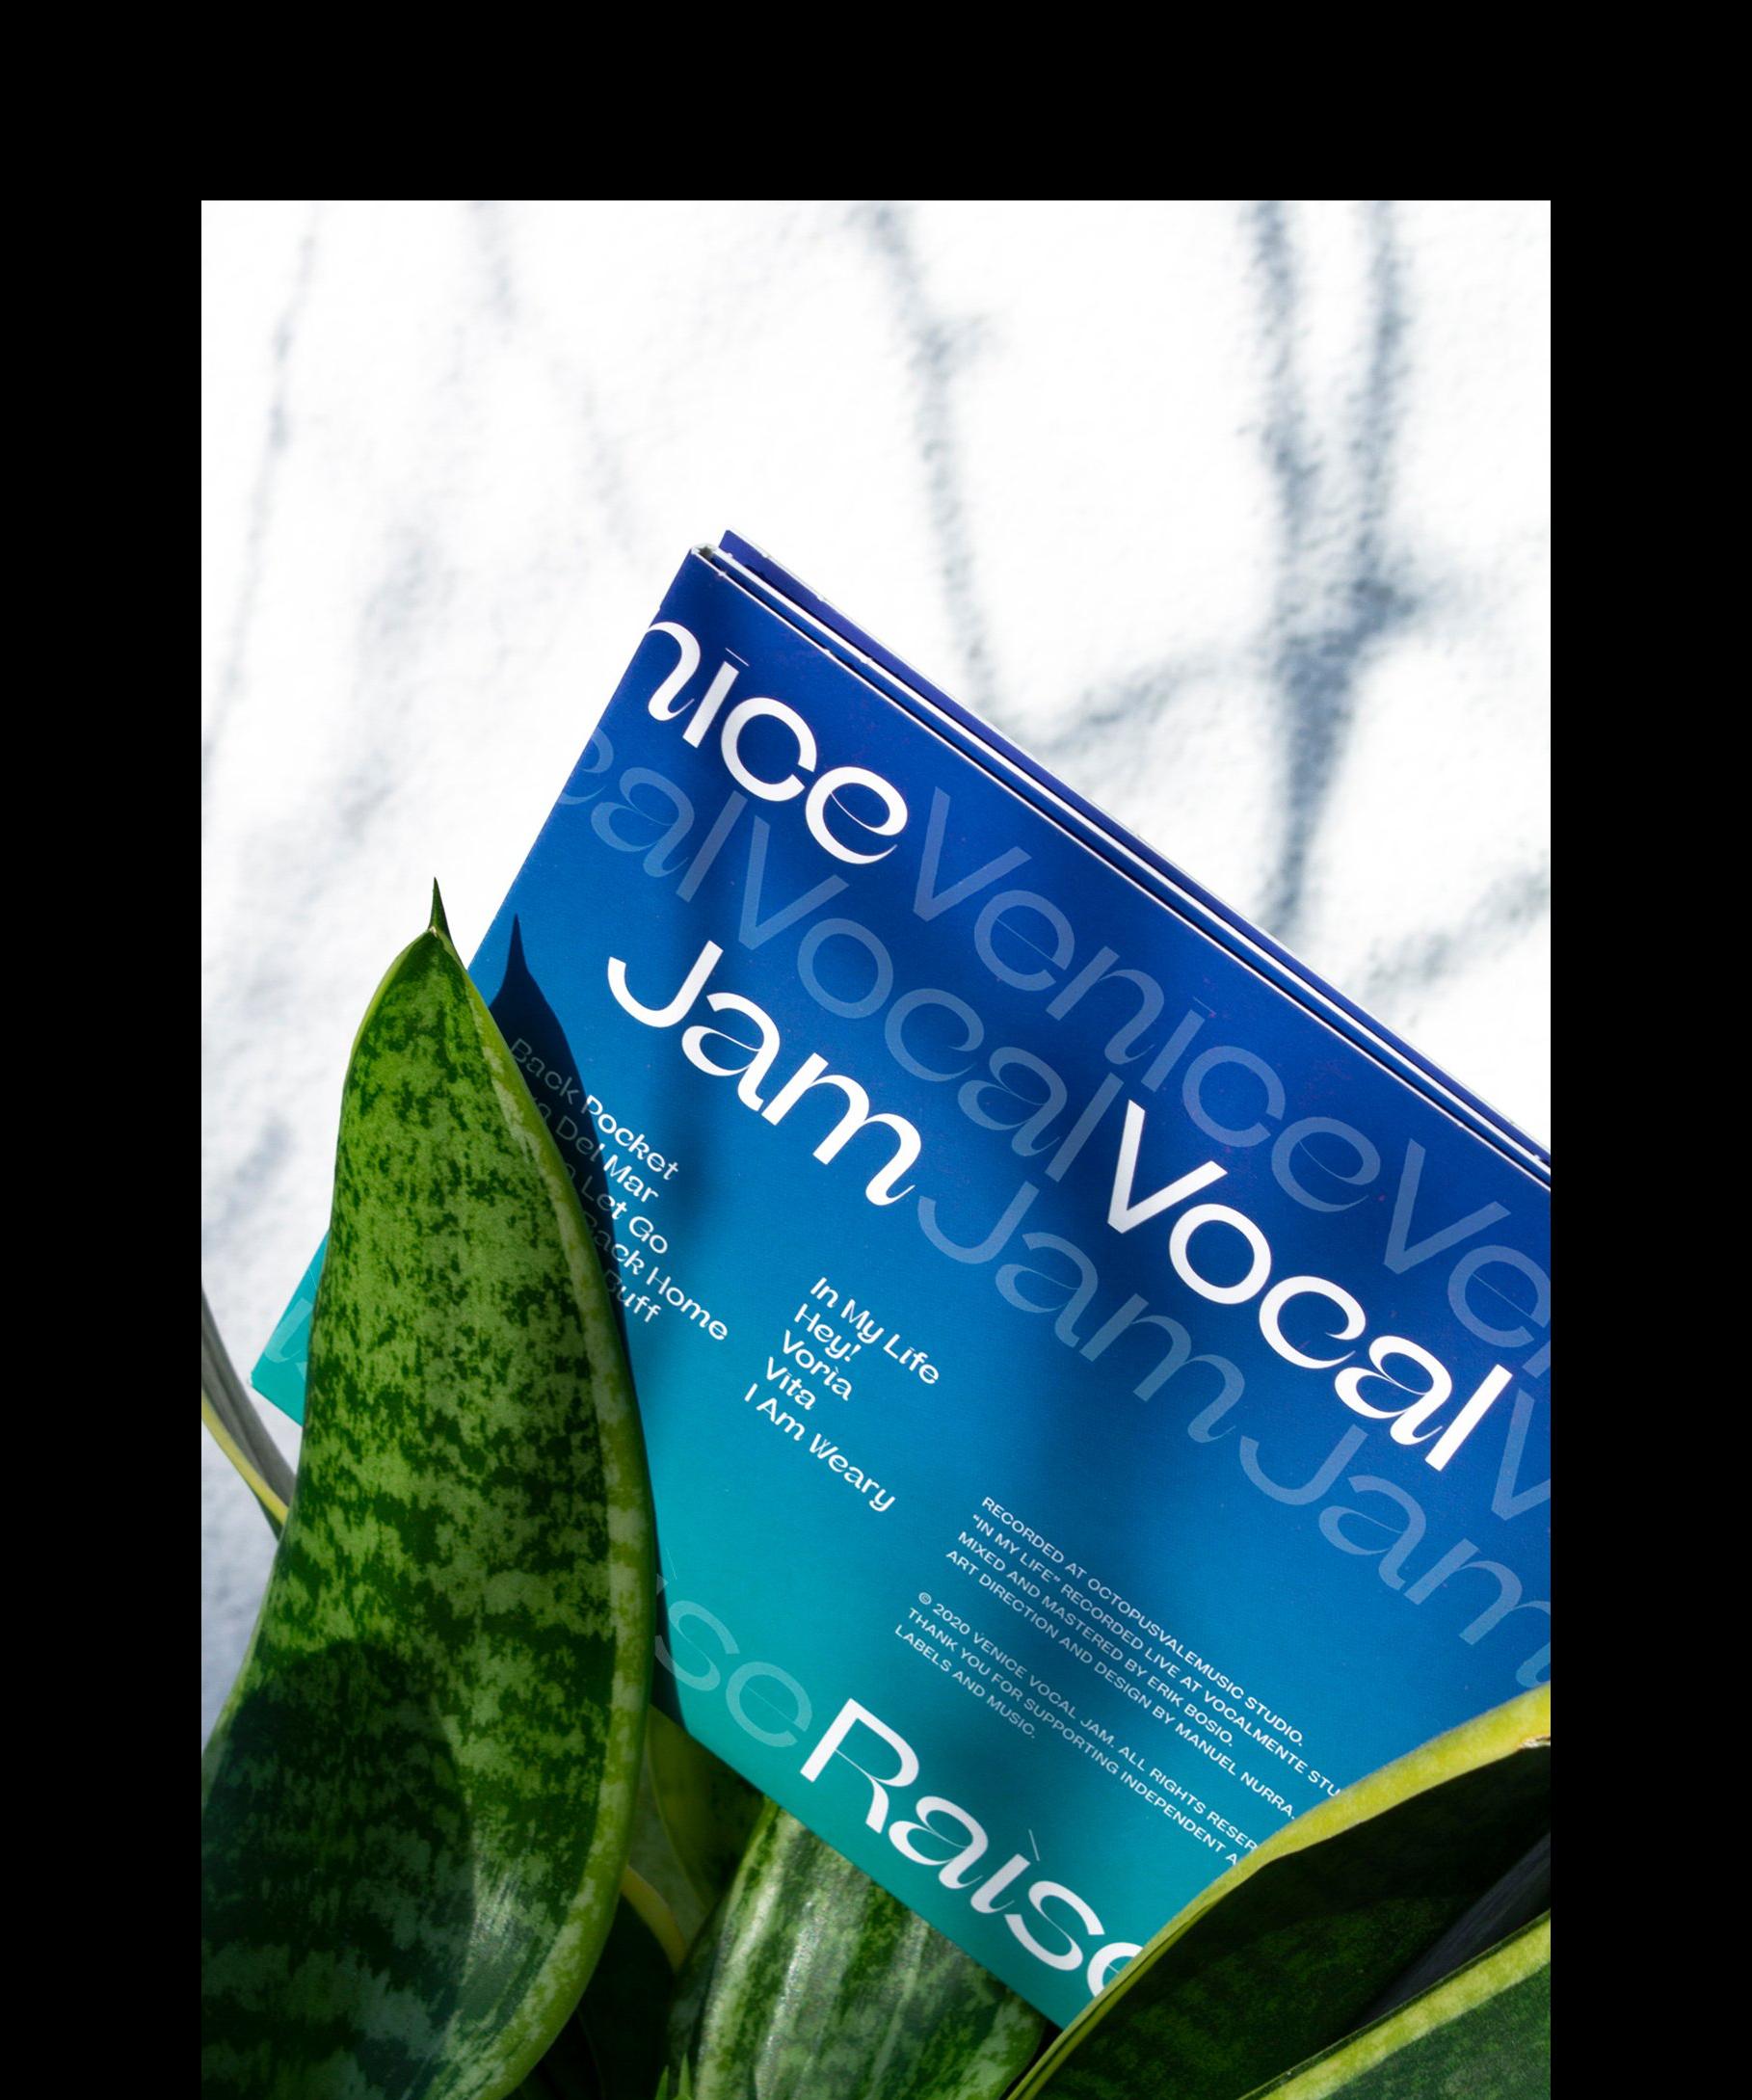 Beatrice Display Venice Vocal Jam 2